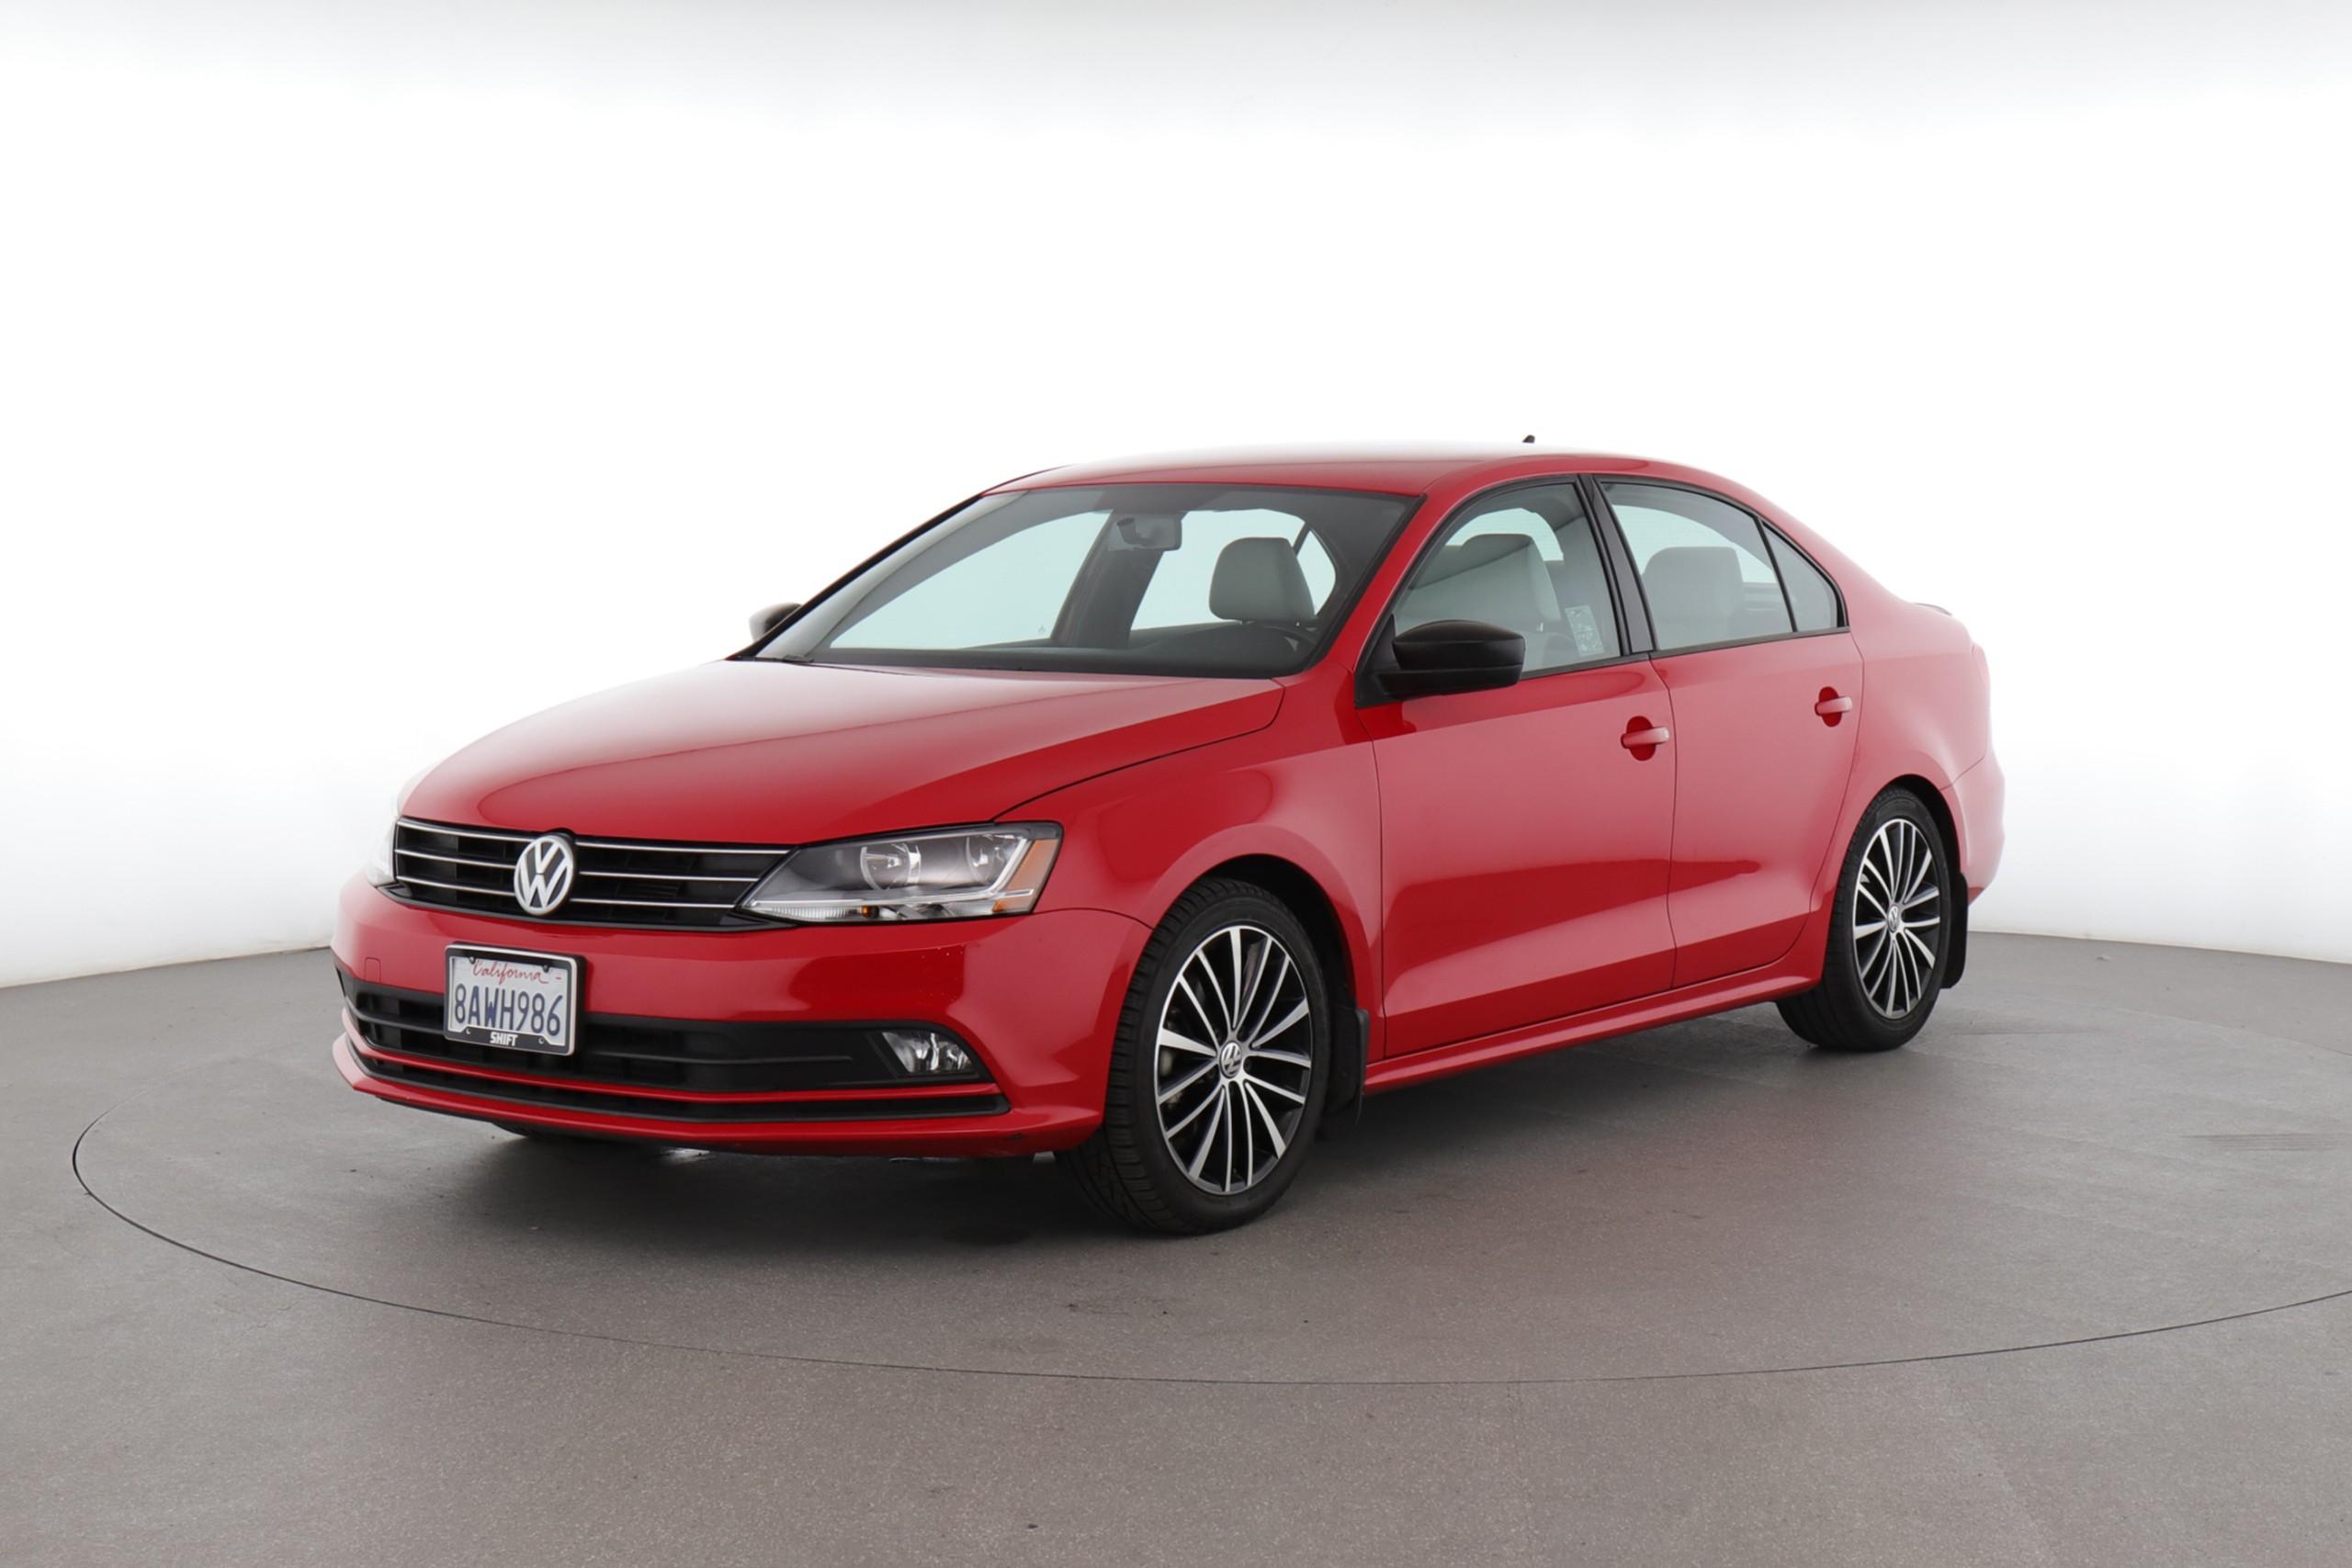 2017 Volkswagen Jetta 1.8T Sport (from $17,650)